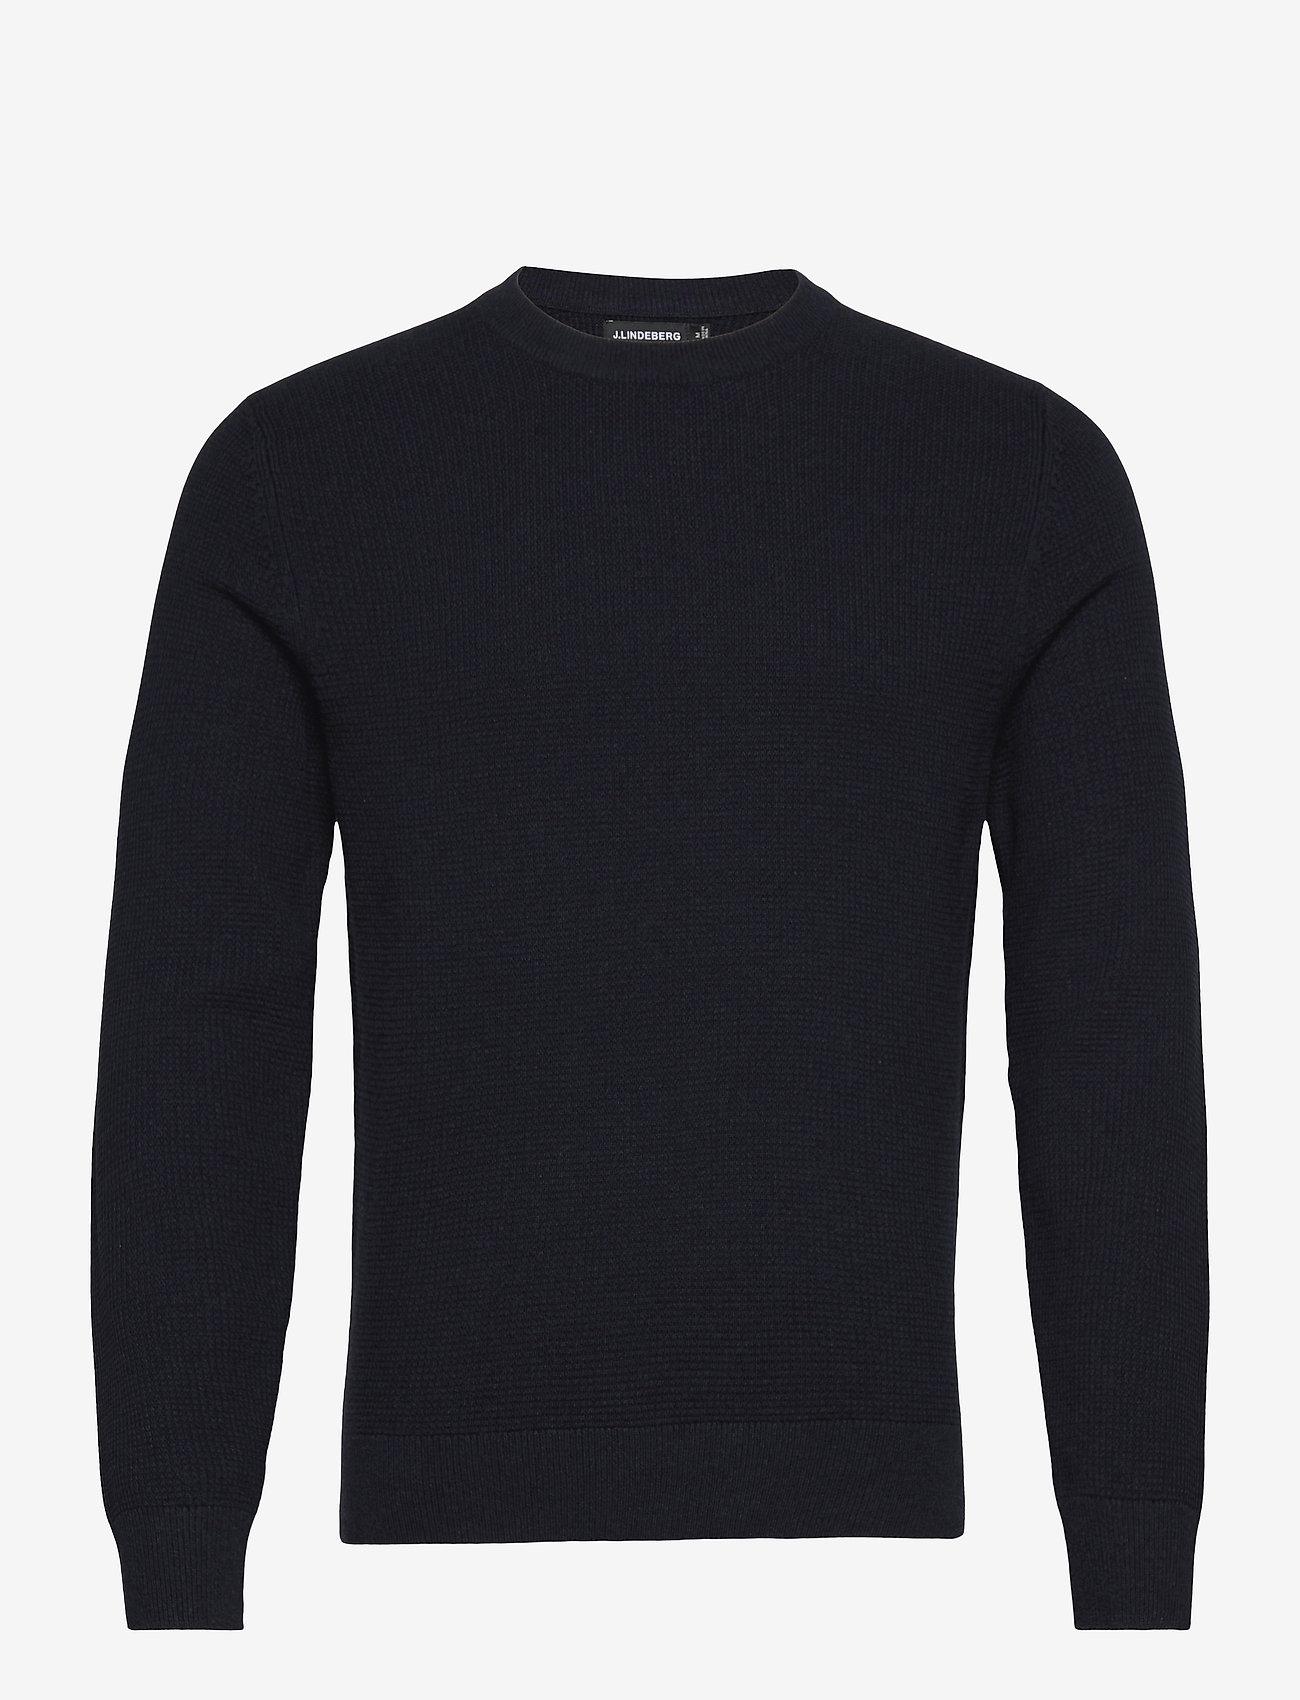 J. Lindeberg - Andy Structure C-Neck Sweater - basic-strickmode - jl navy - 1